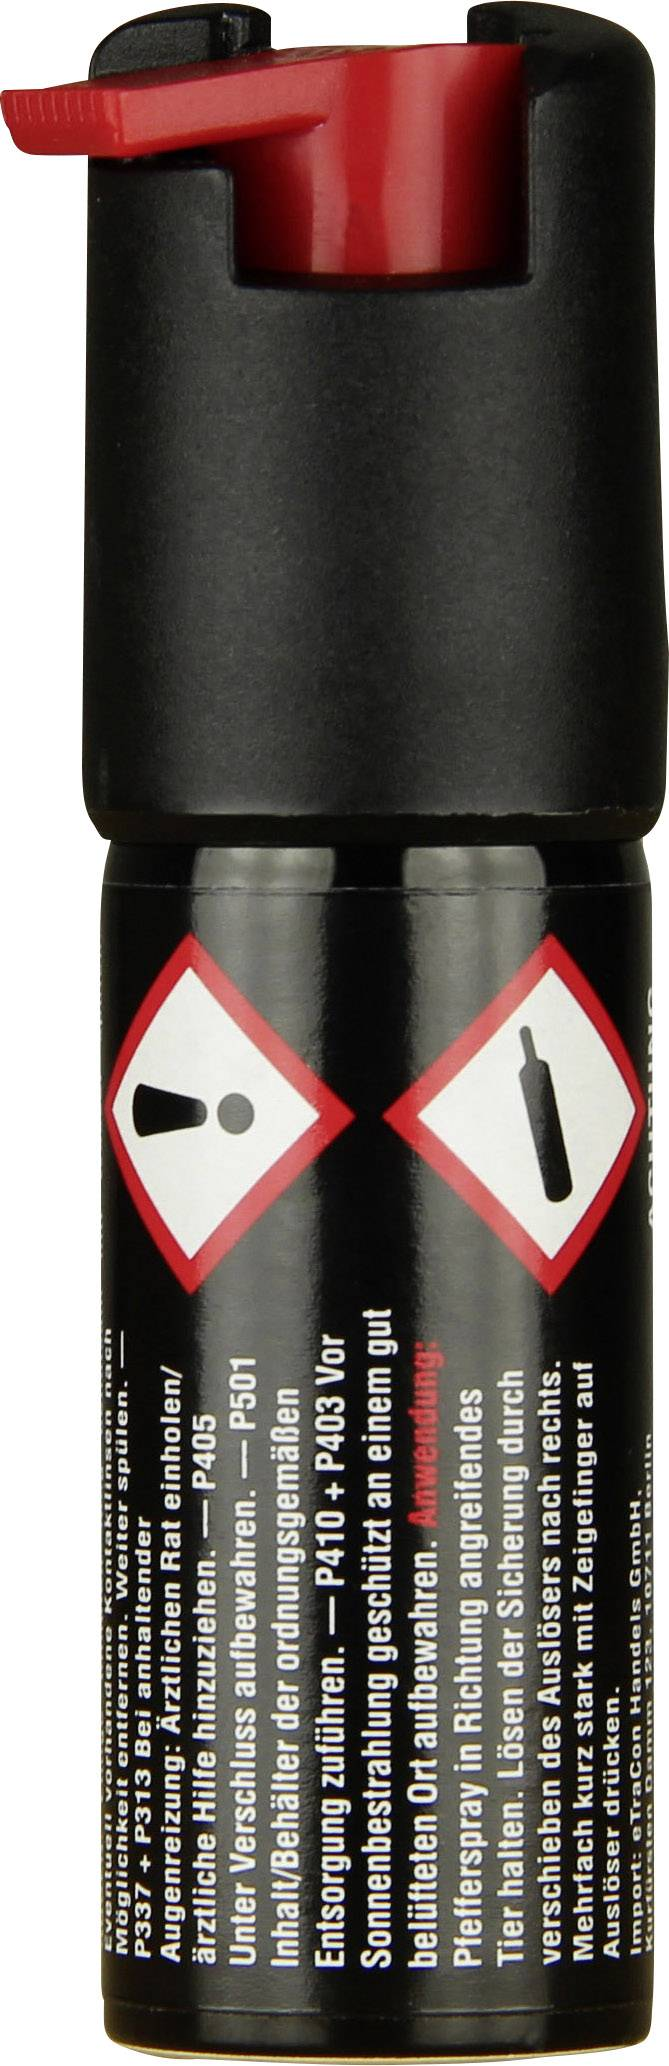 Pfefferspray 16 ml kh-security 130202